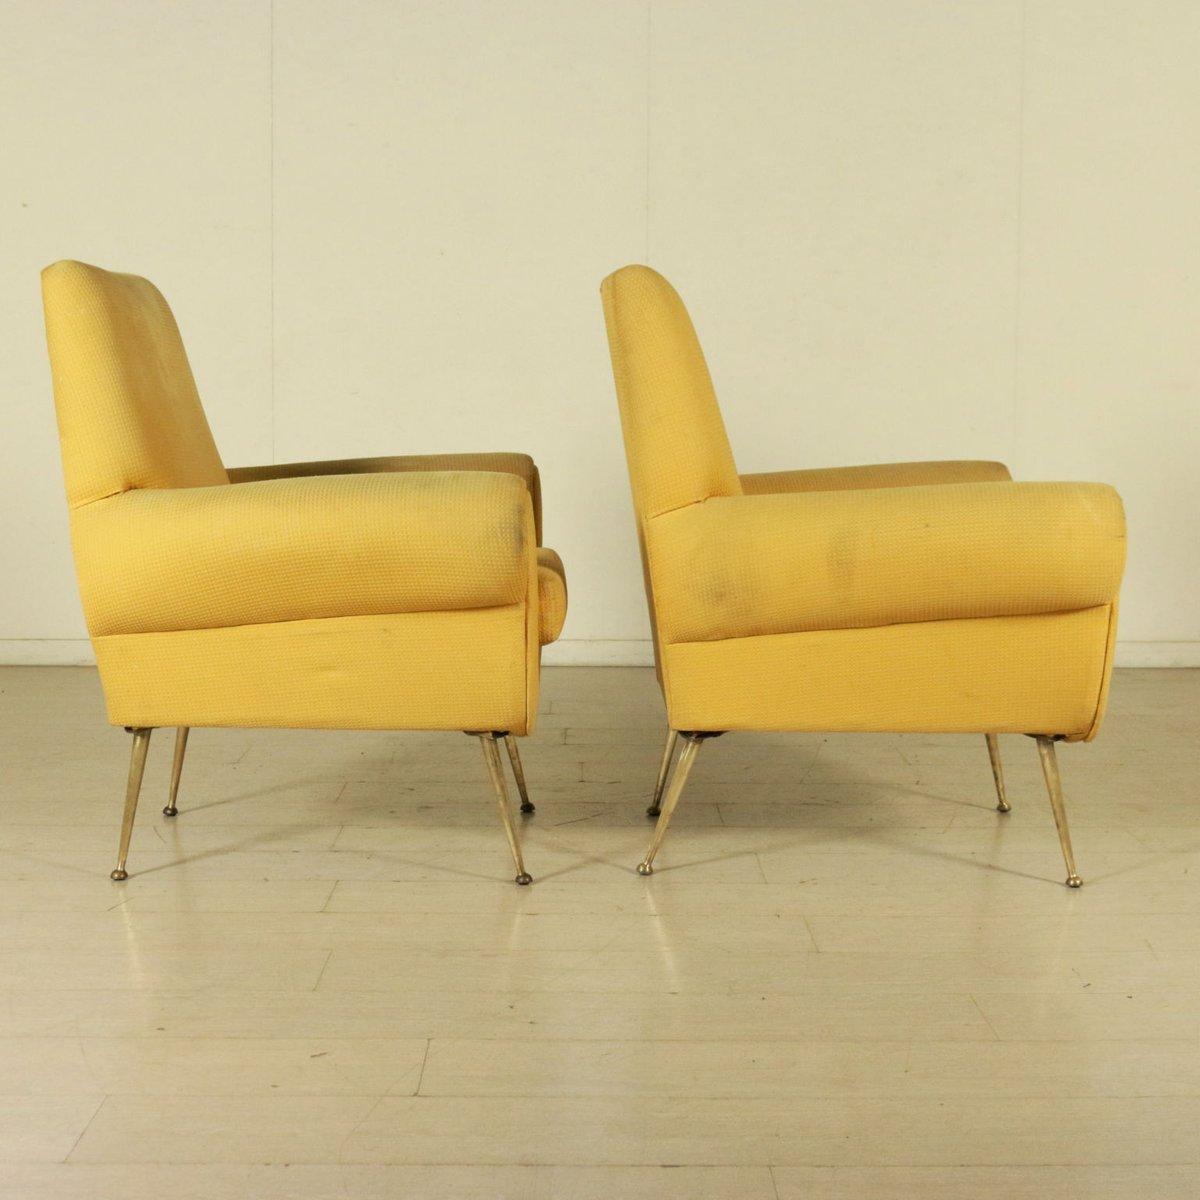 Italian Vintage Armchairs With Foam Padding Fabric